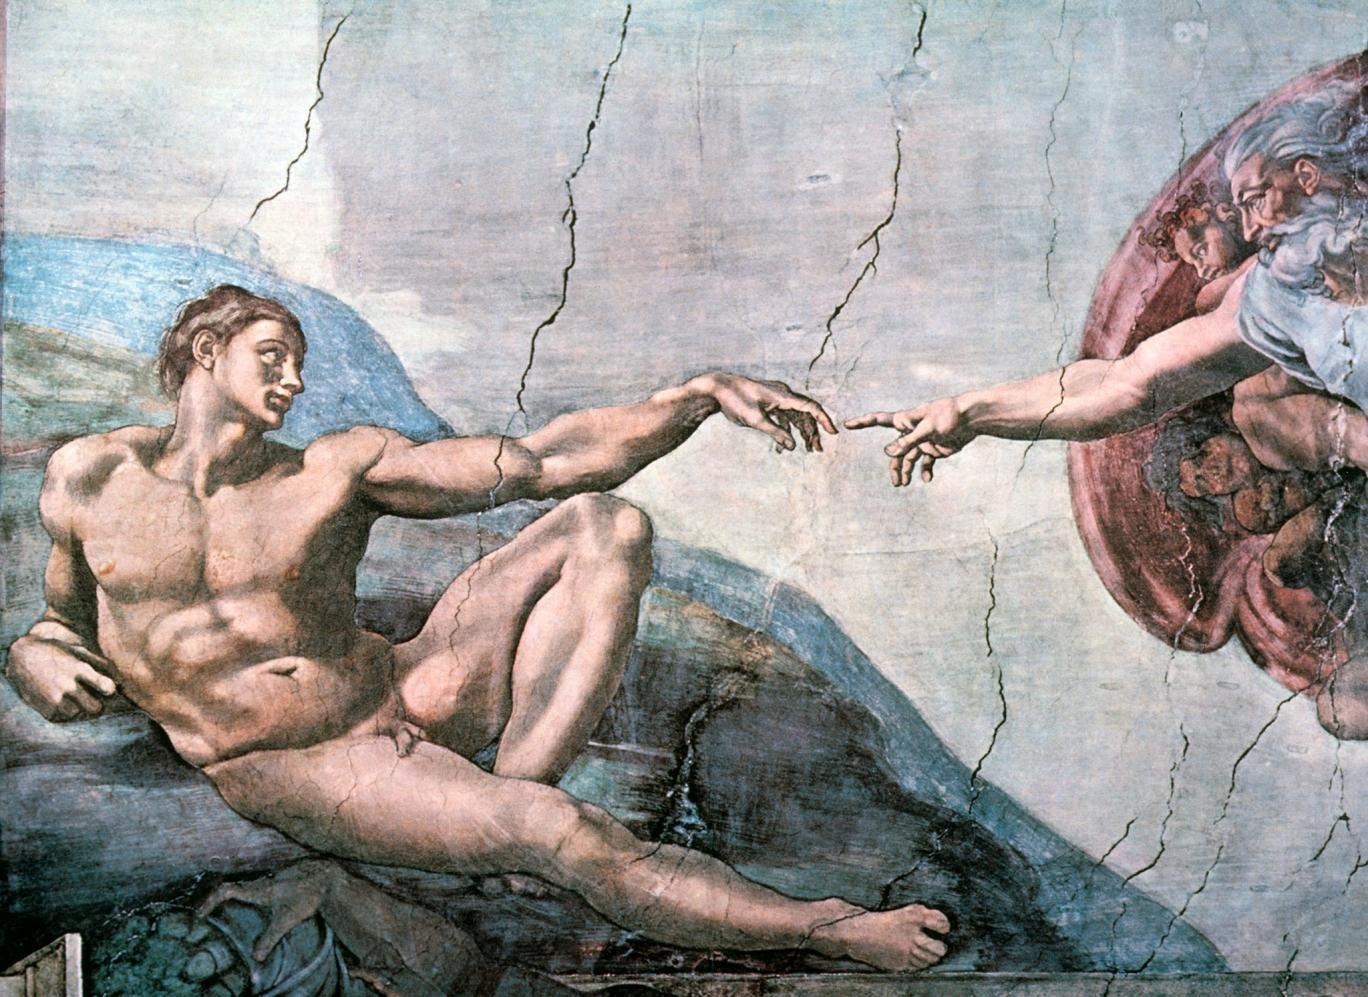 Finger on the pulse: Michelangelo's 'God Creates Adam'